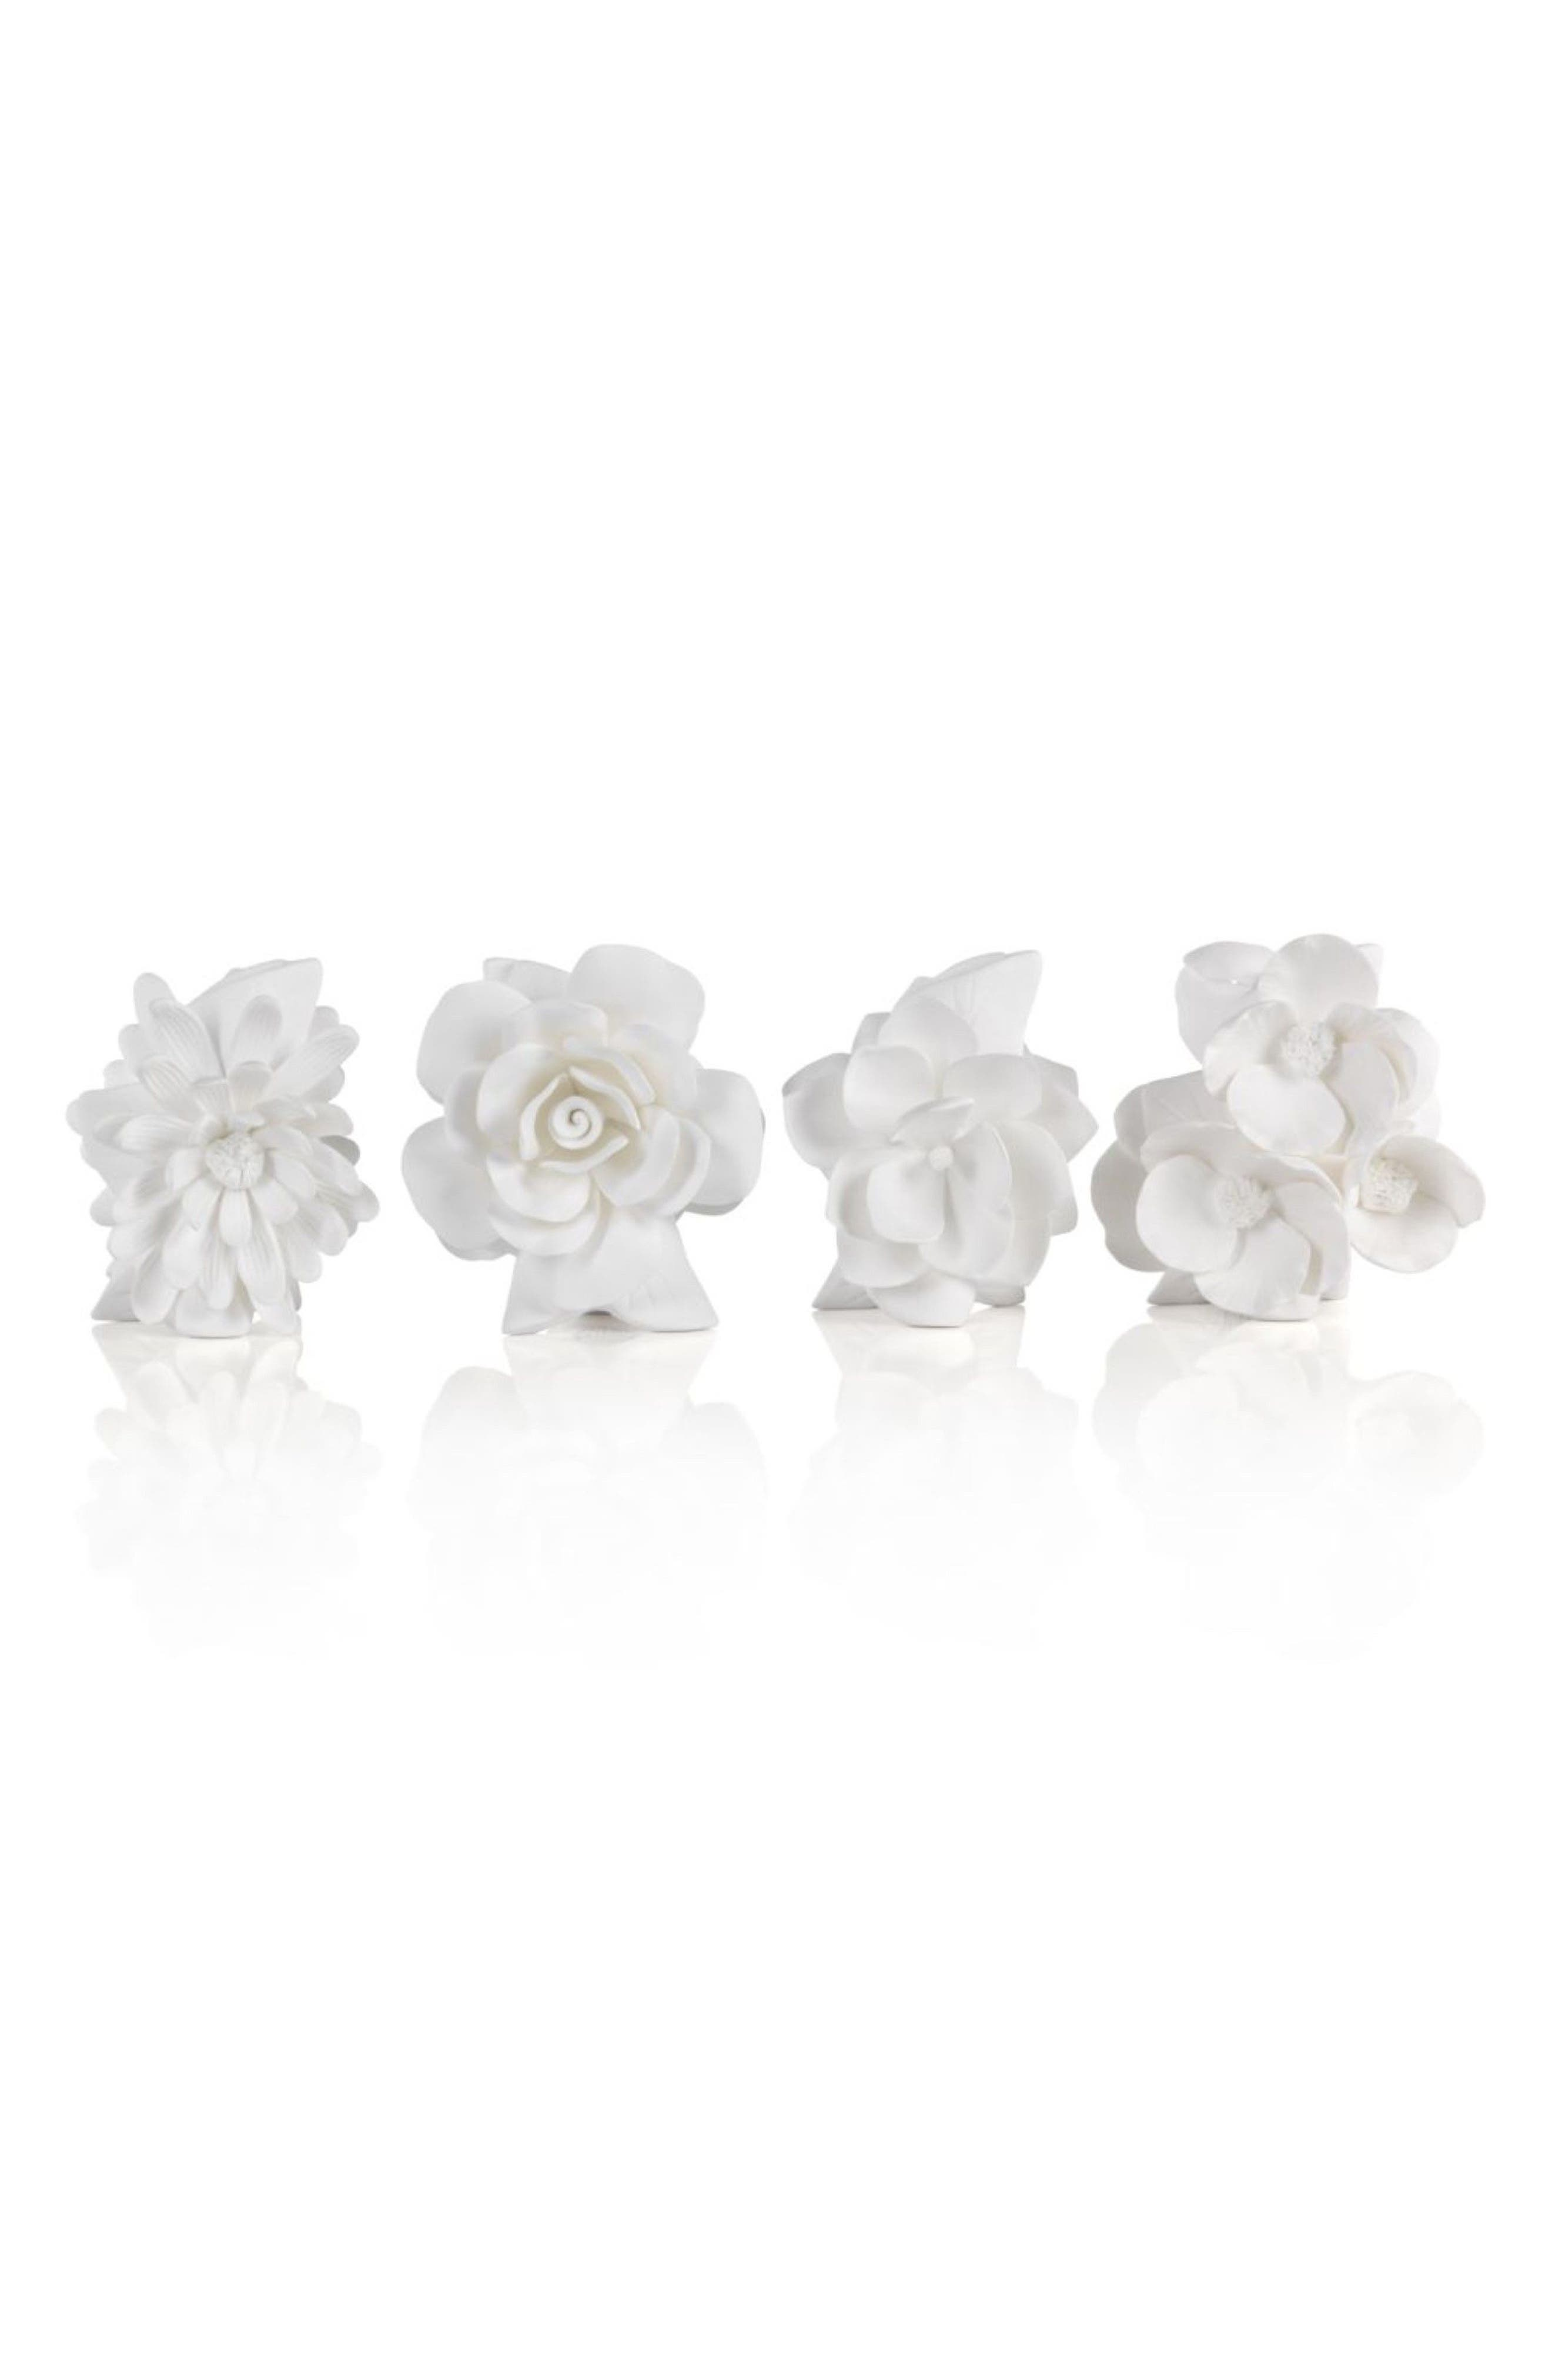 Cameo Set of 4 Porcelain Vases,                             Main thumbnail 1, color,                             White